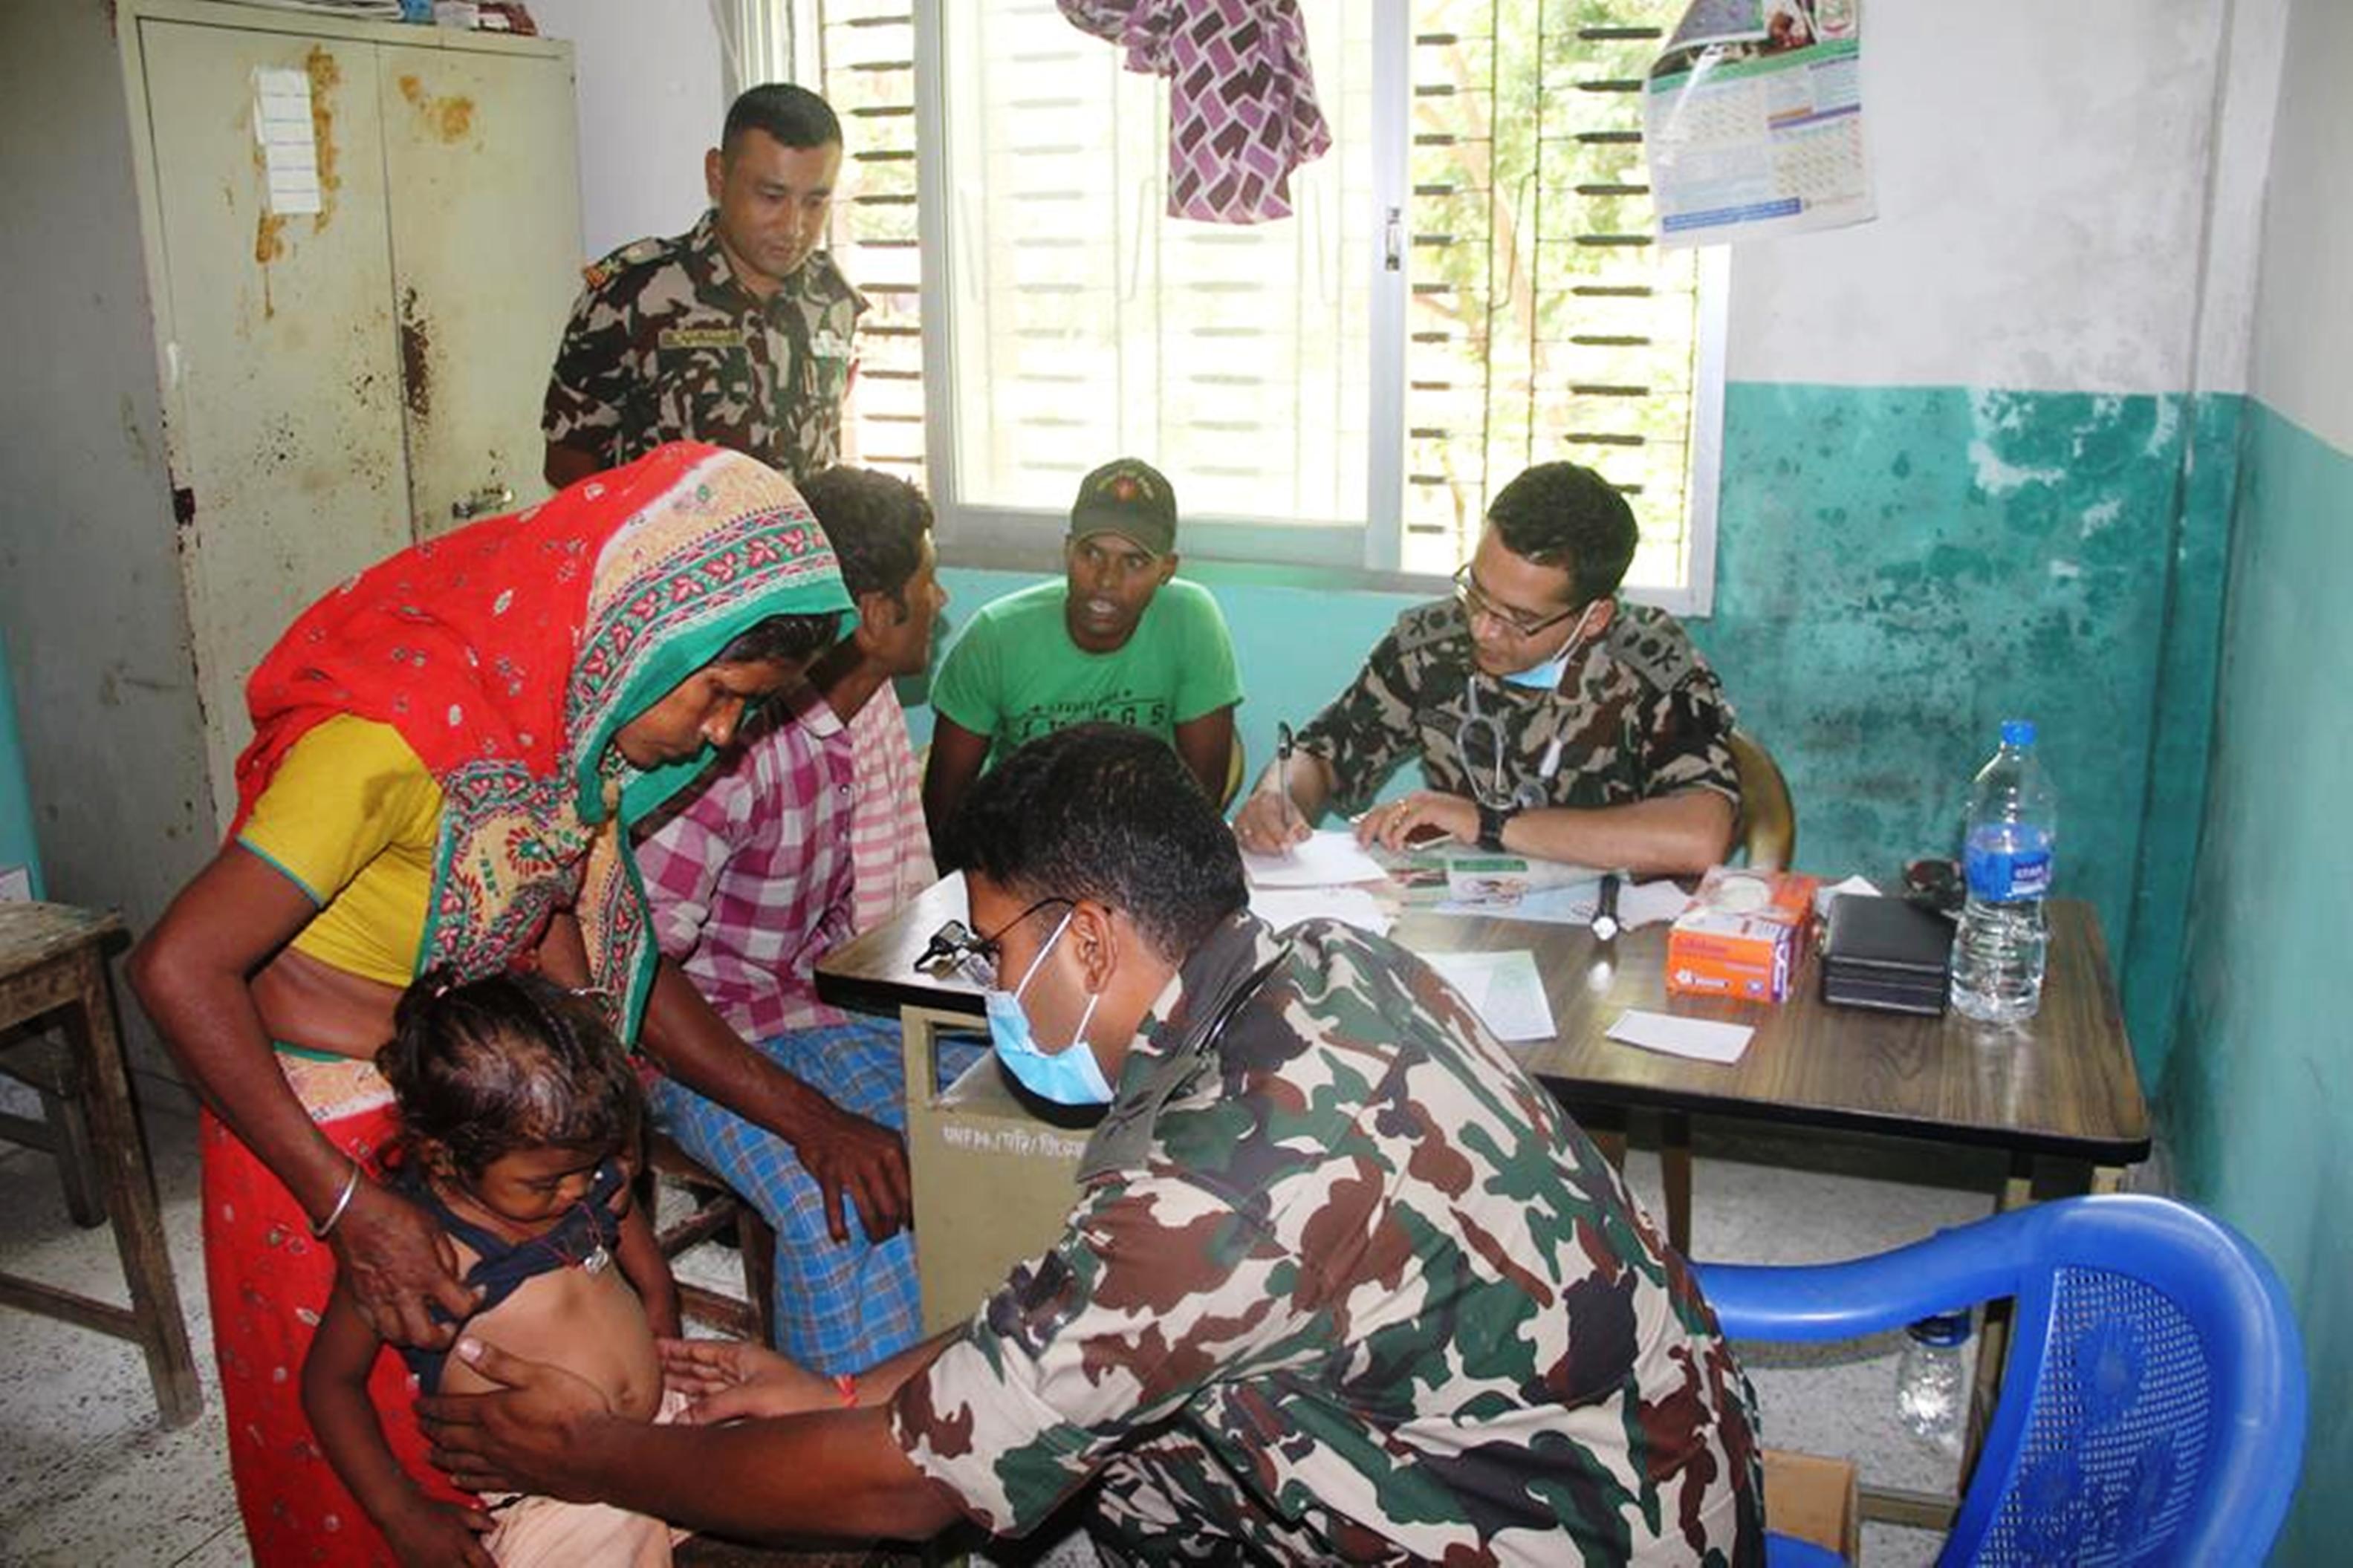 Doctors examining denizens of Dumriya in Ishanath Municipality, Rautahat at a free health camp ran by Nepal Armyu2019s Indra Box Battalion on Wednesday, May 9, 2018. Photo: Prabhat Kumar Jhan